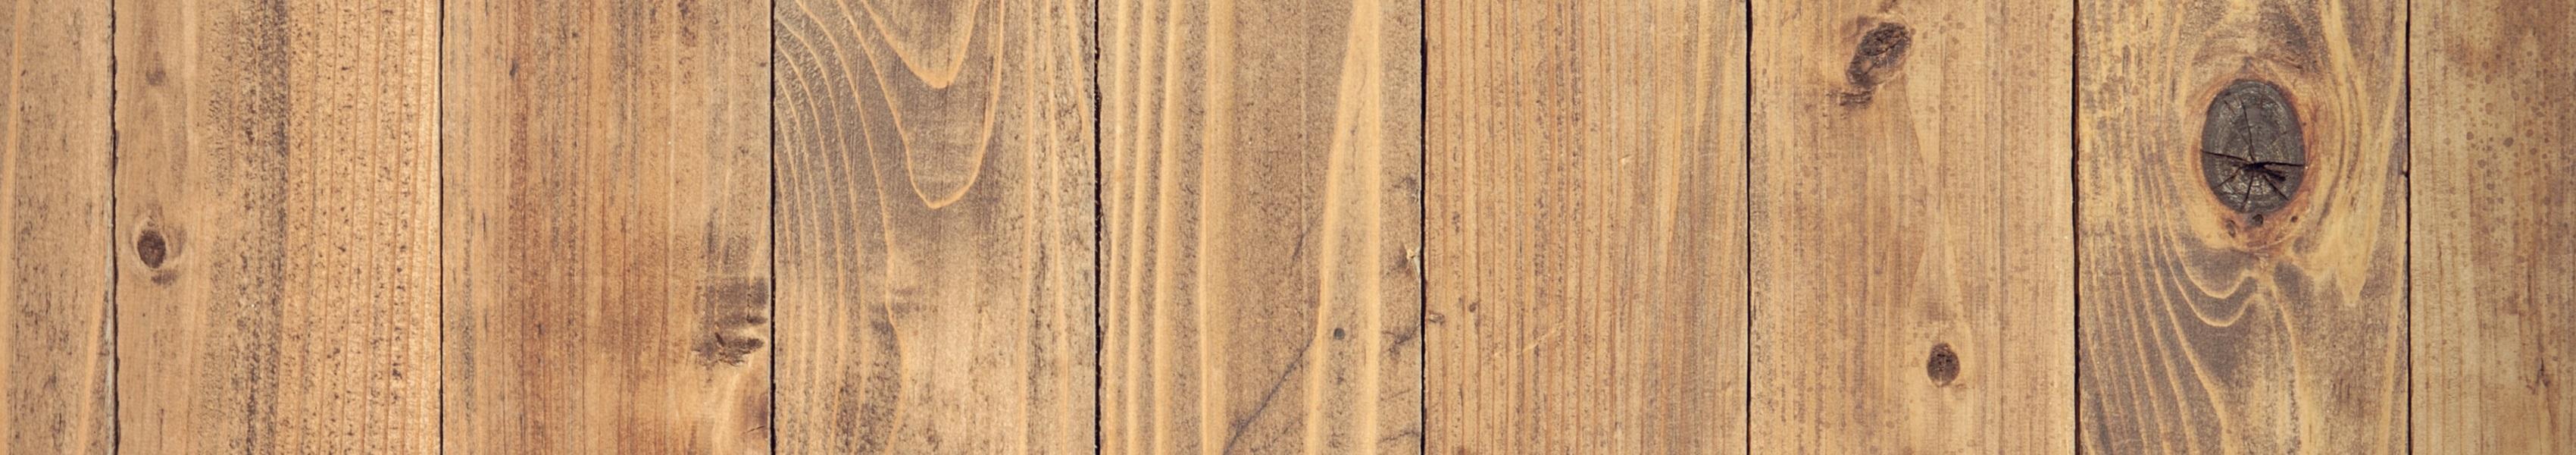 50mm x 35mm  (2 x 1.5) Timber